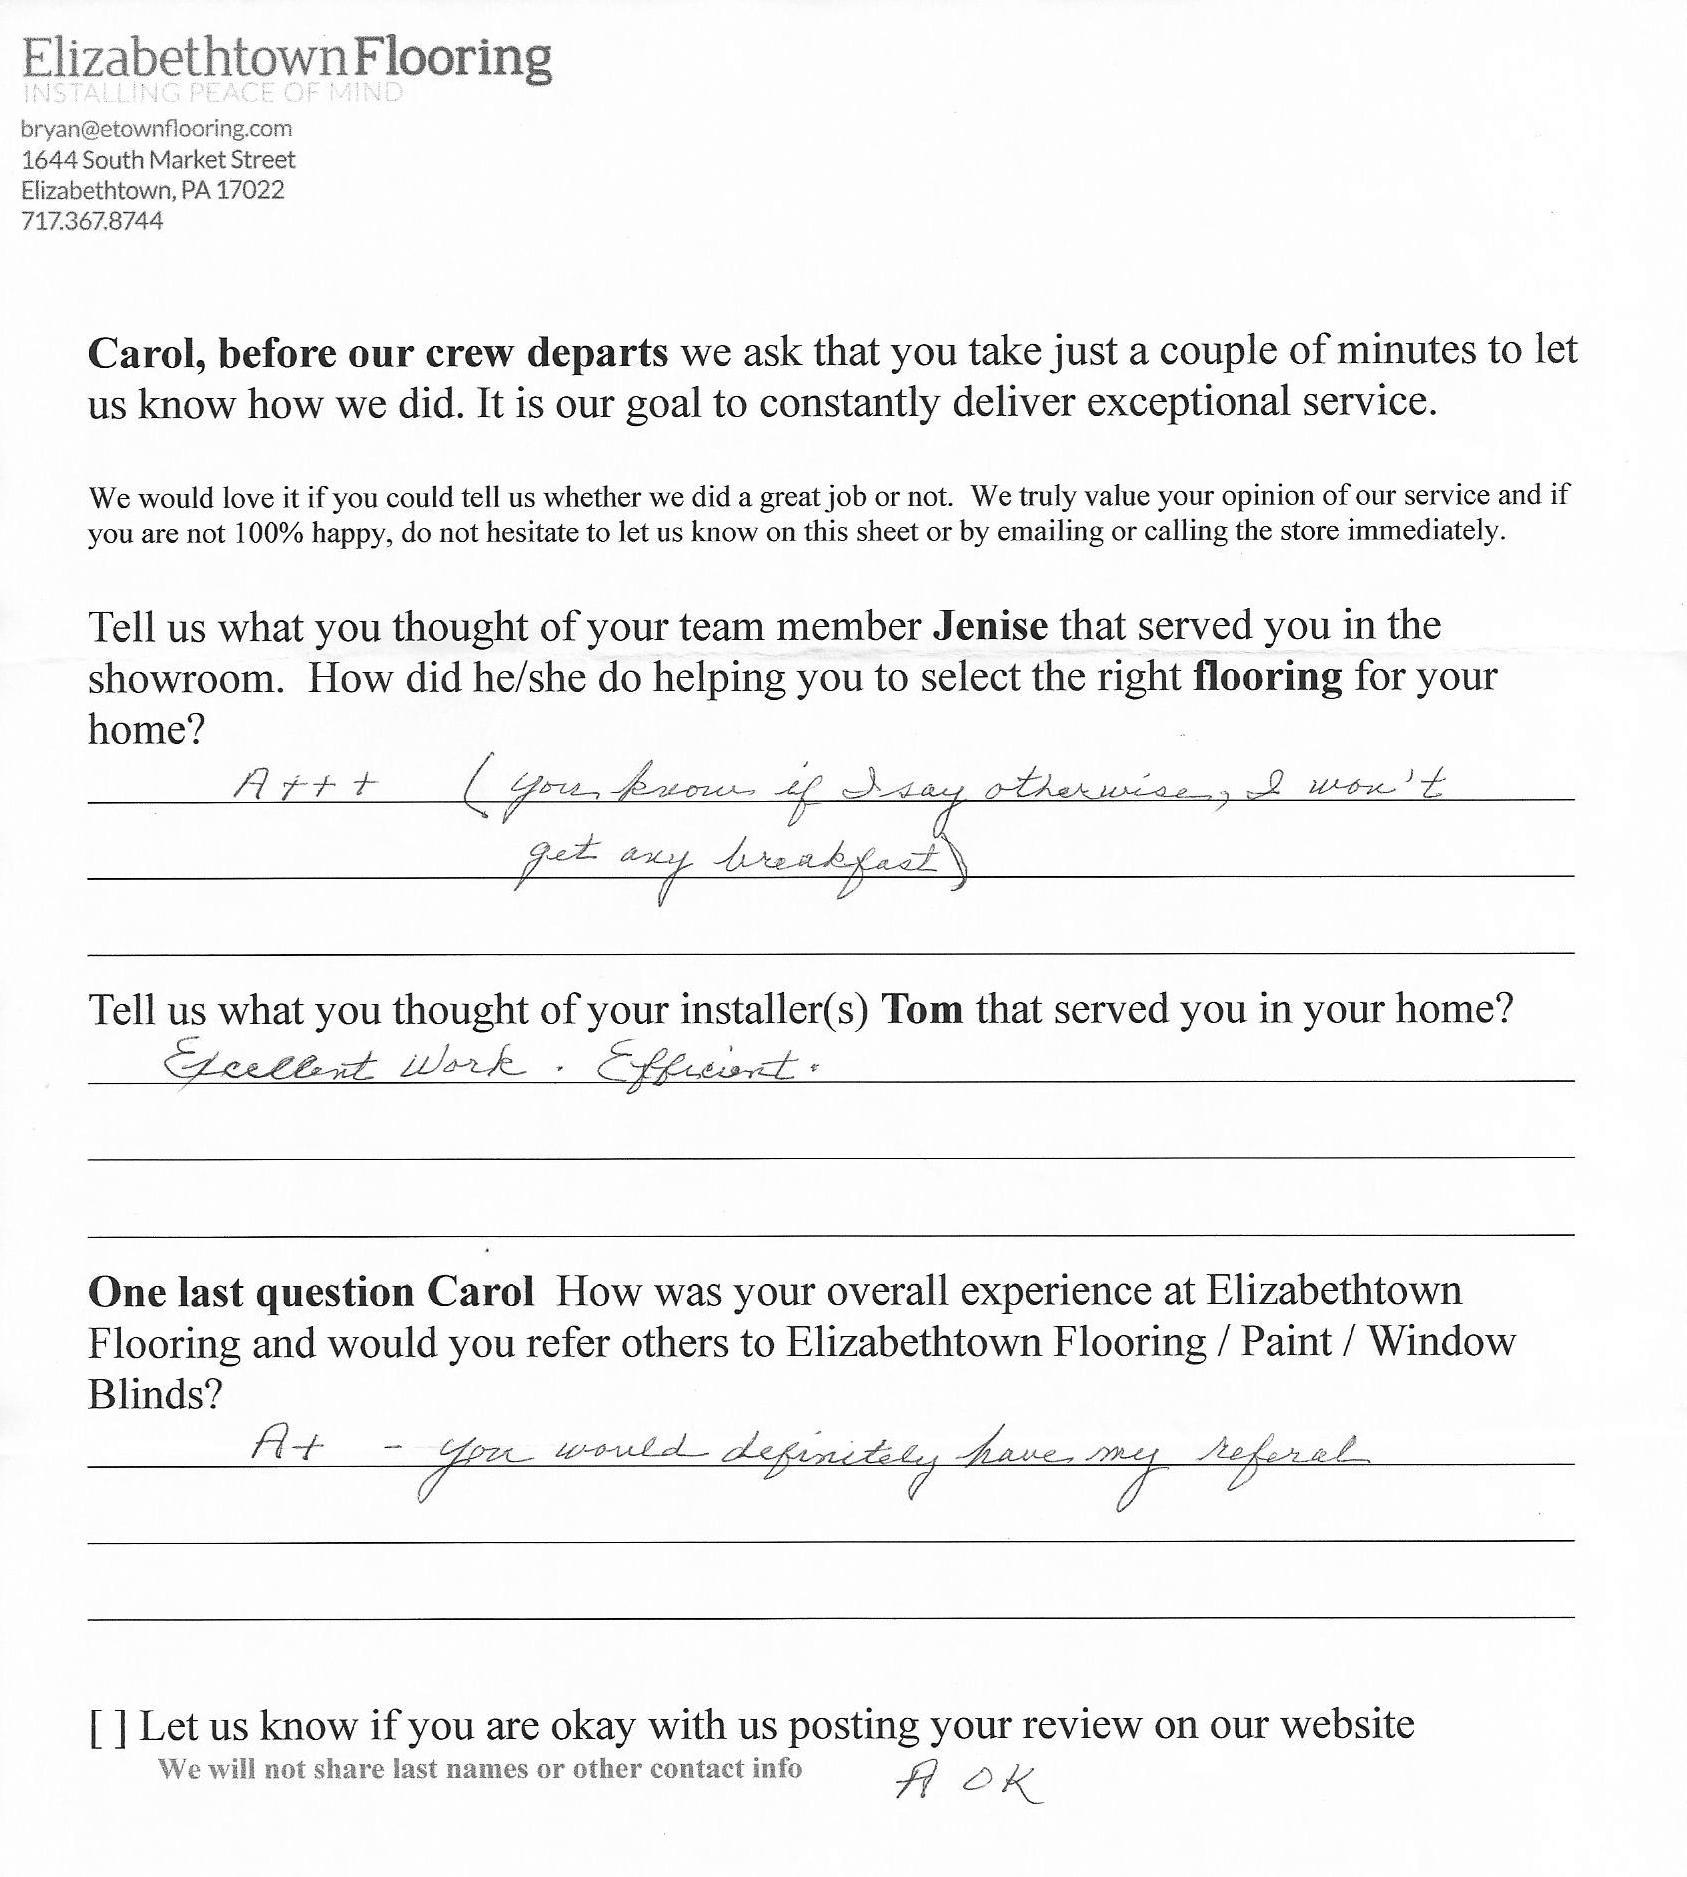 Flooring Review - Carol from Elizabethtown.jpg